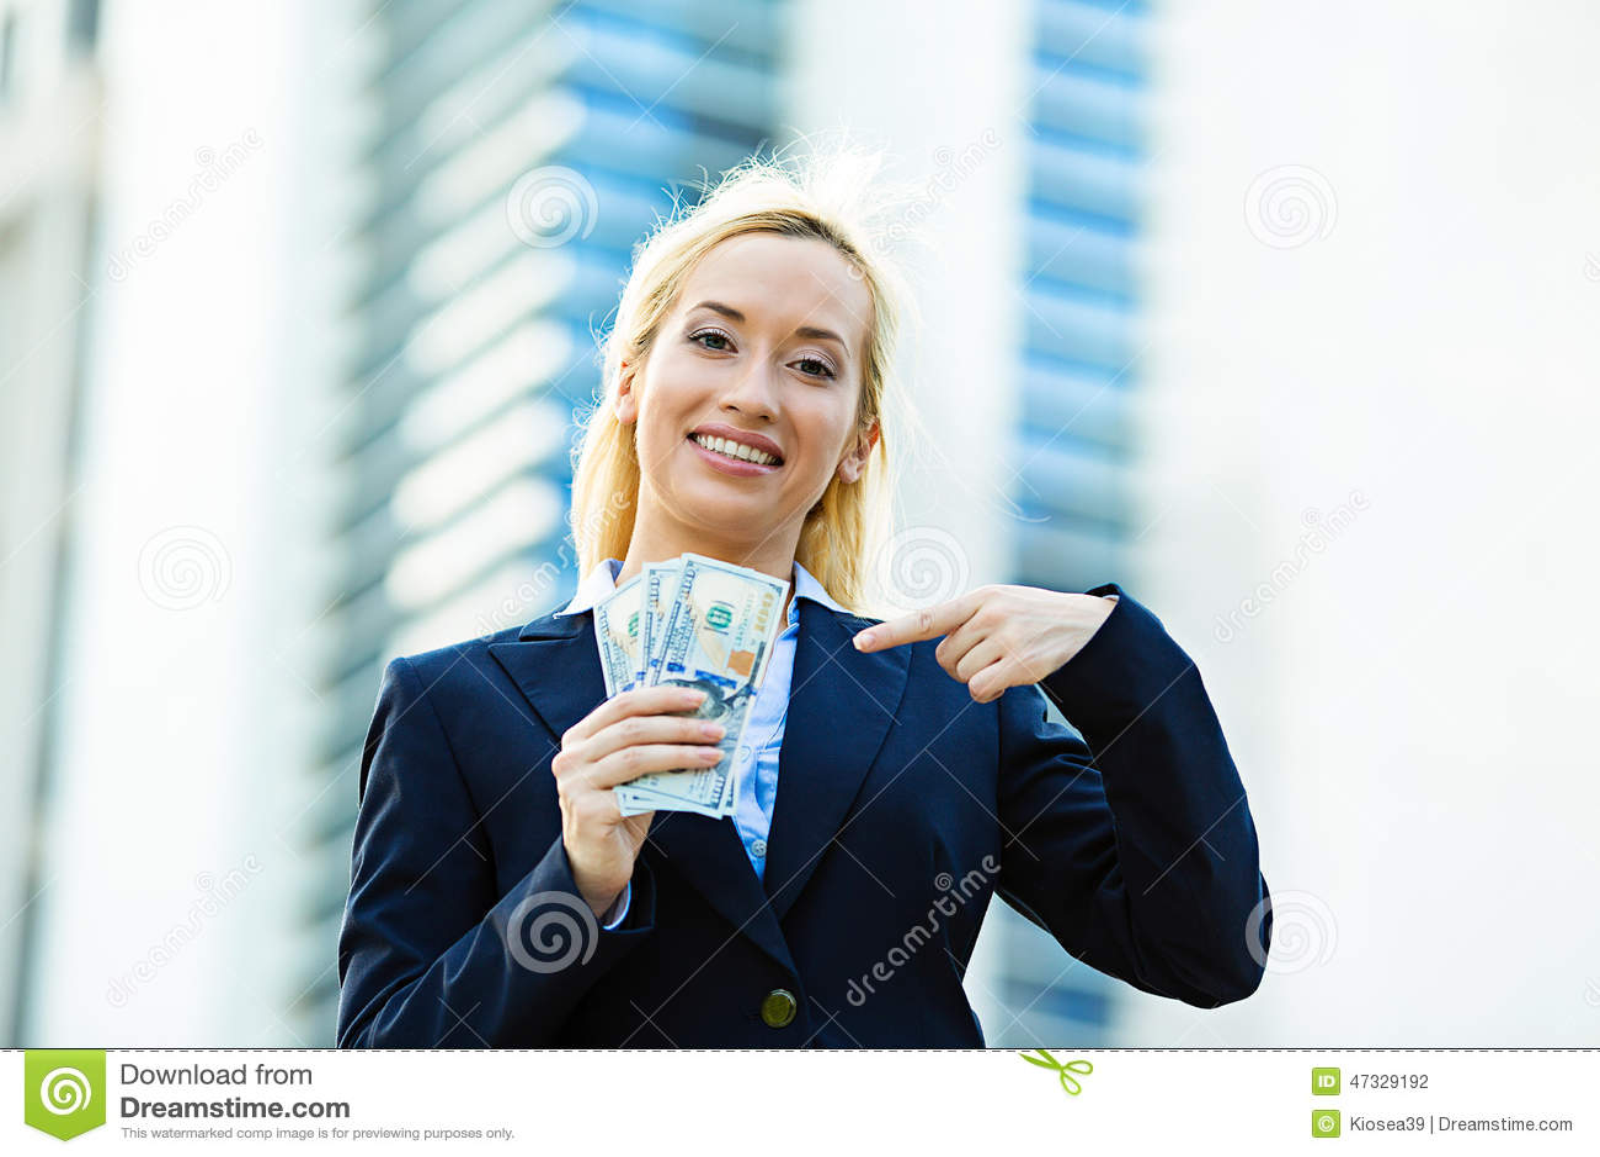 Happy Woman Holding Dollar Bills Stock Photo - Image: 47329192